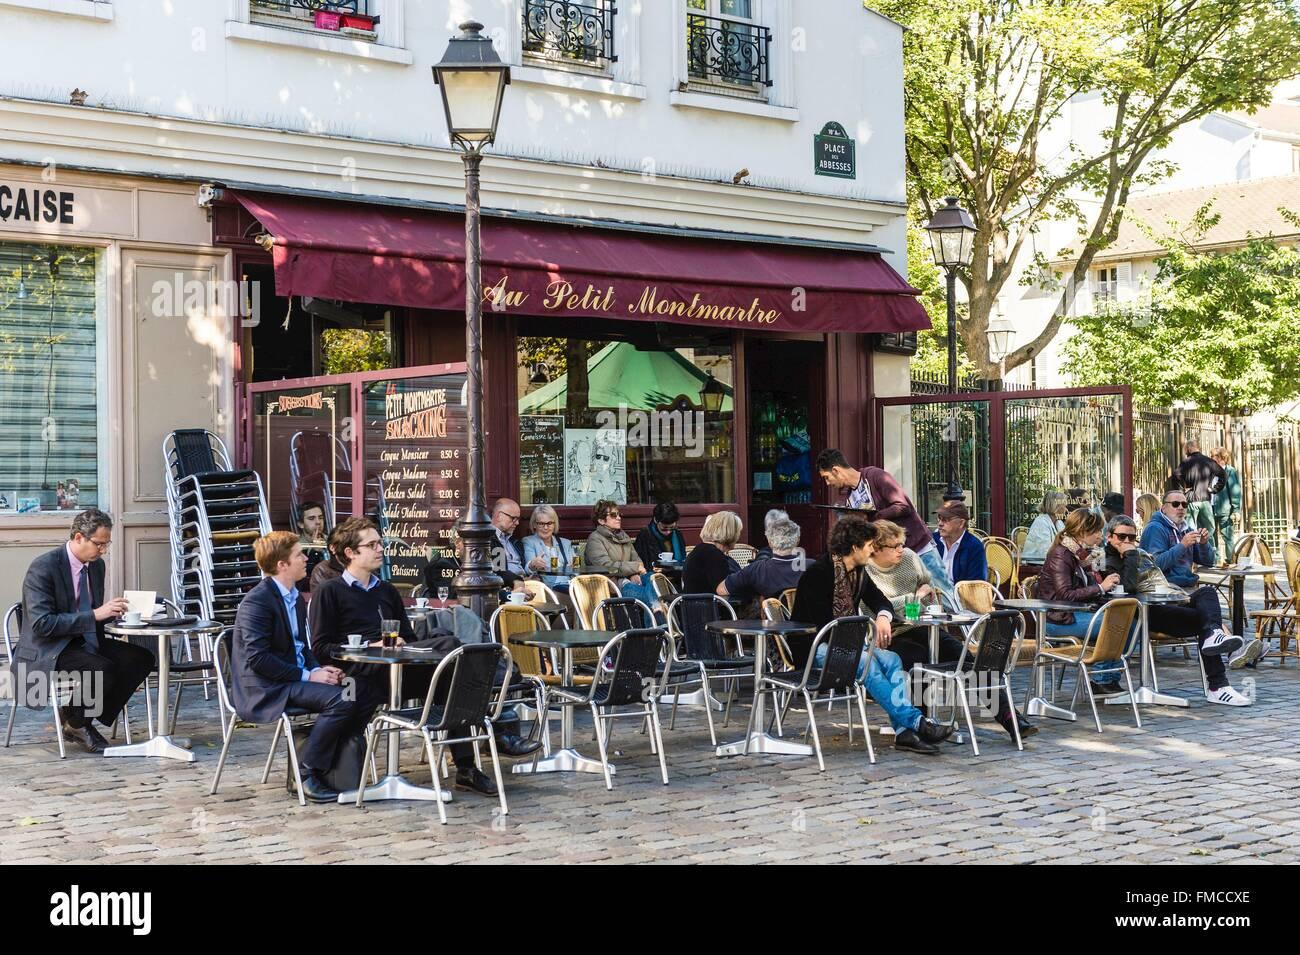 Caf Ef Bf Bd St Georges Paris